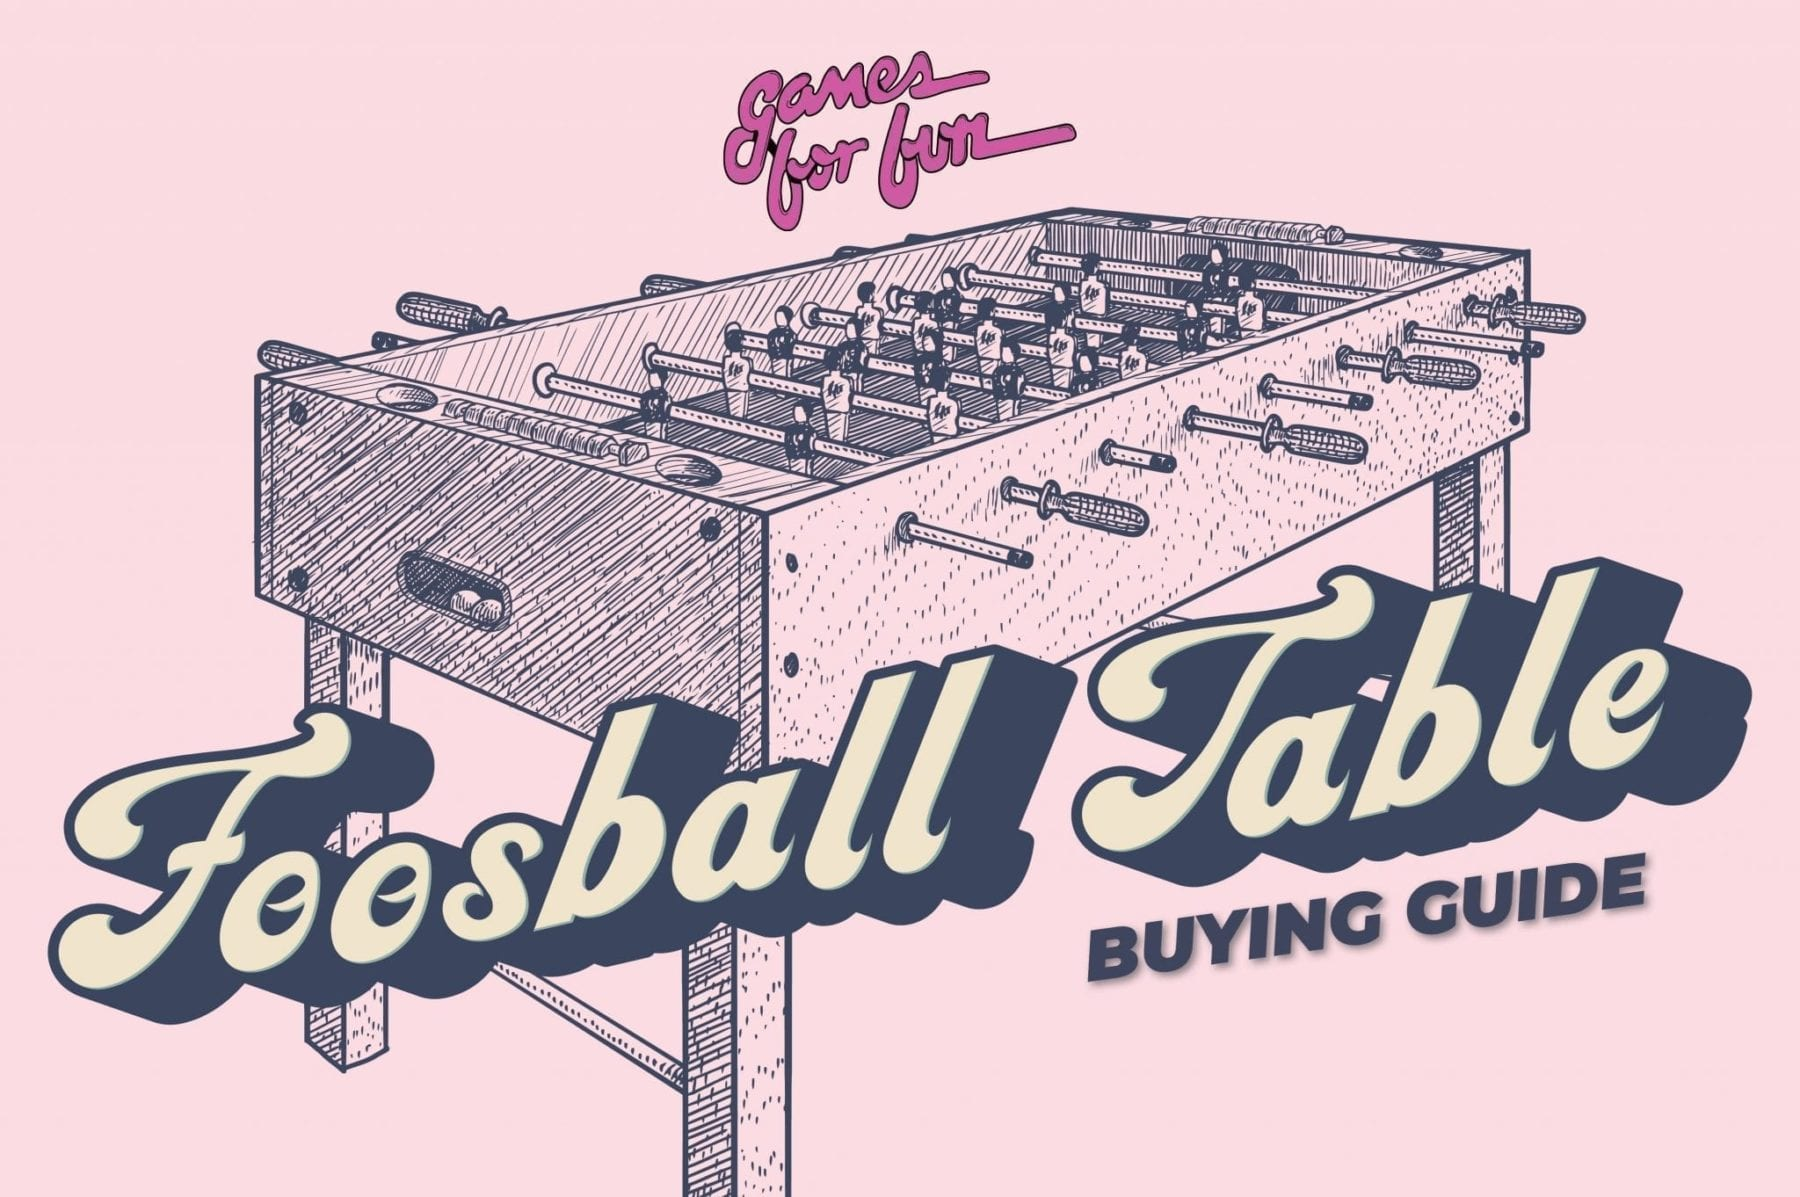 Foosball, Foosball Table Buying Guide